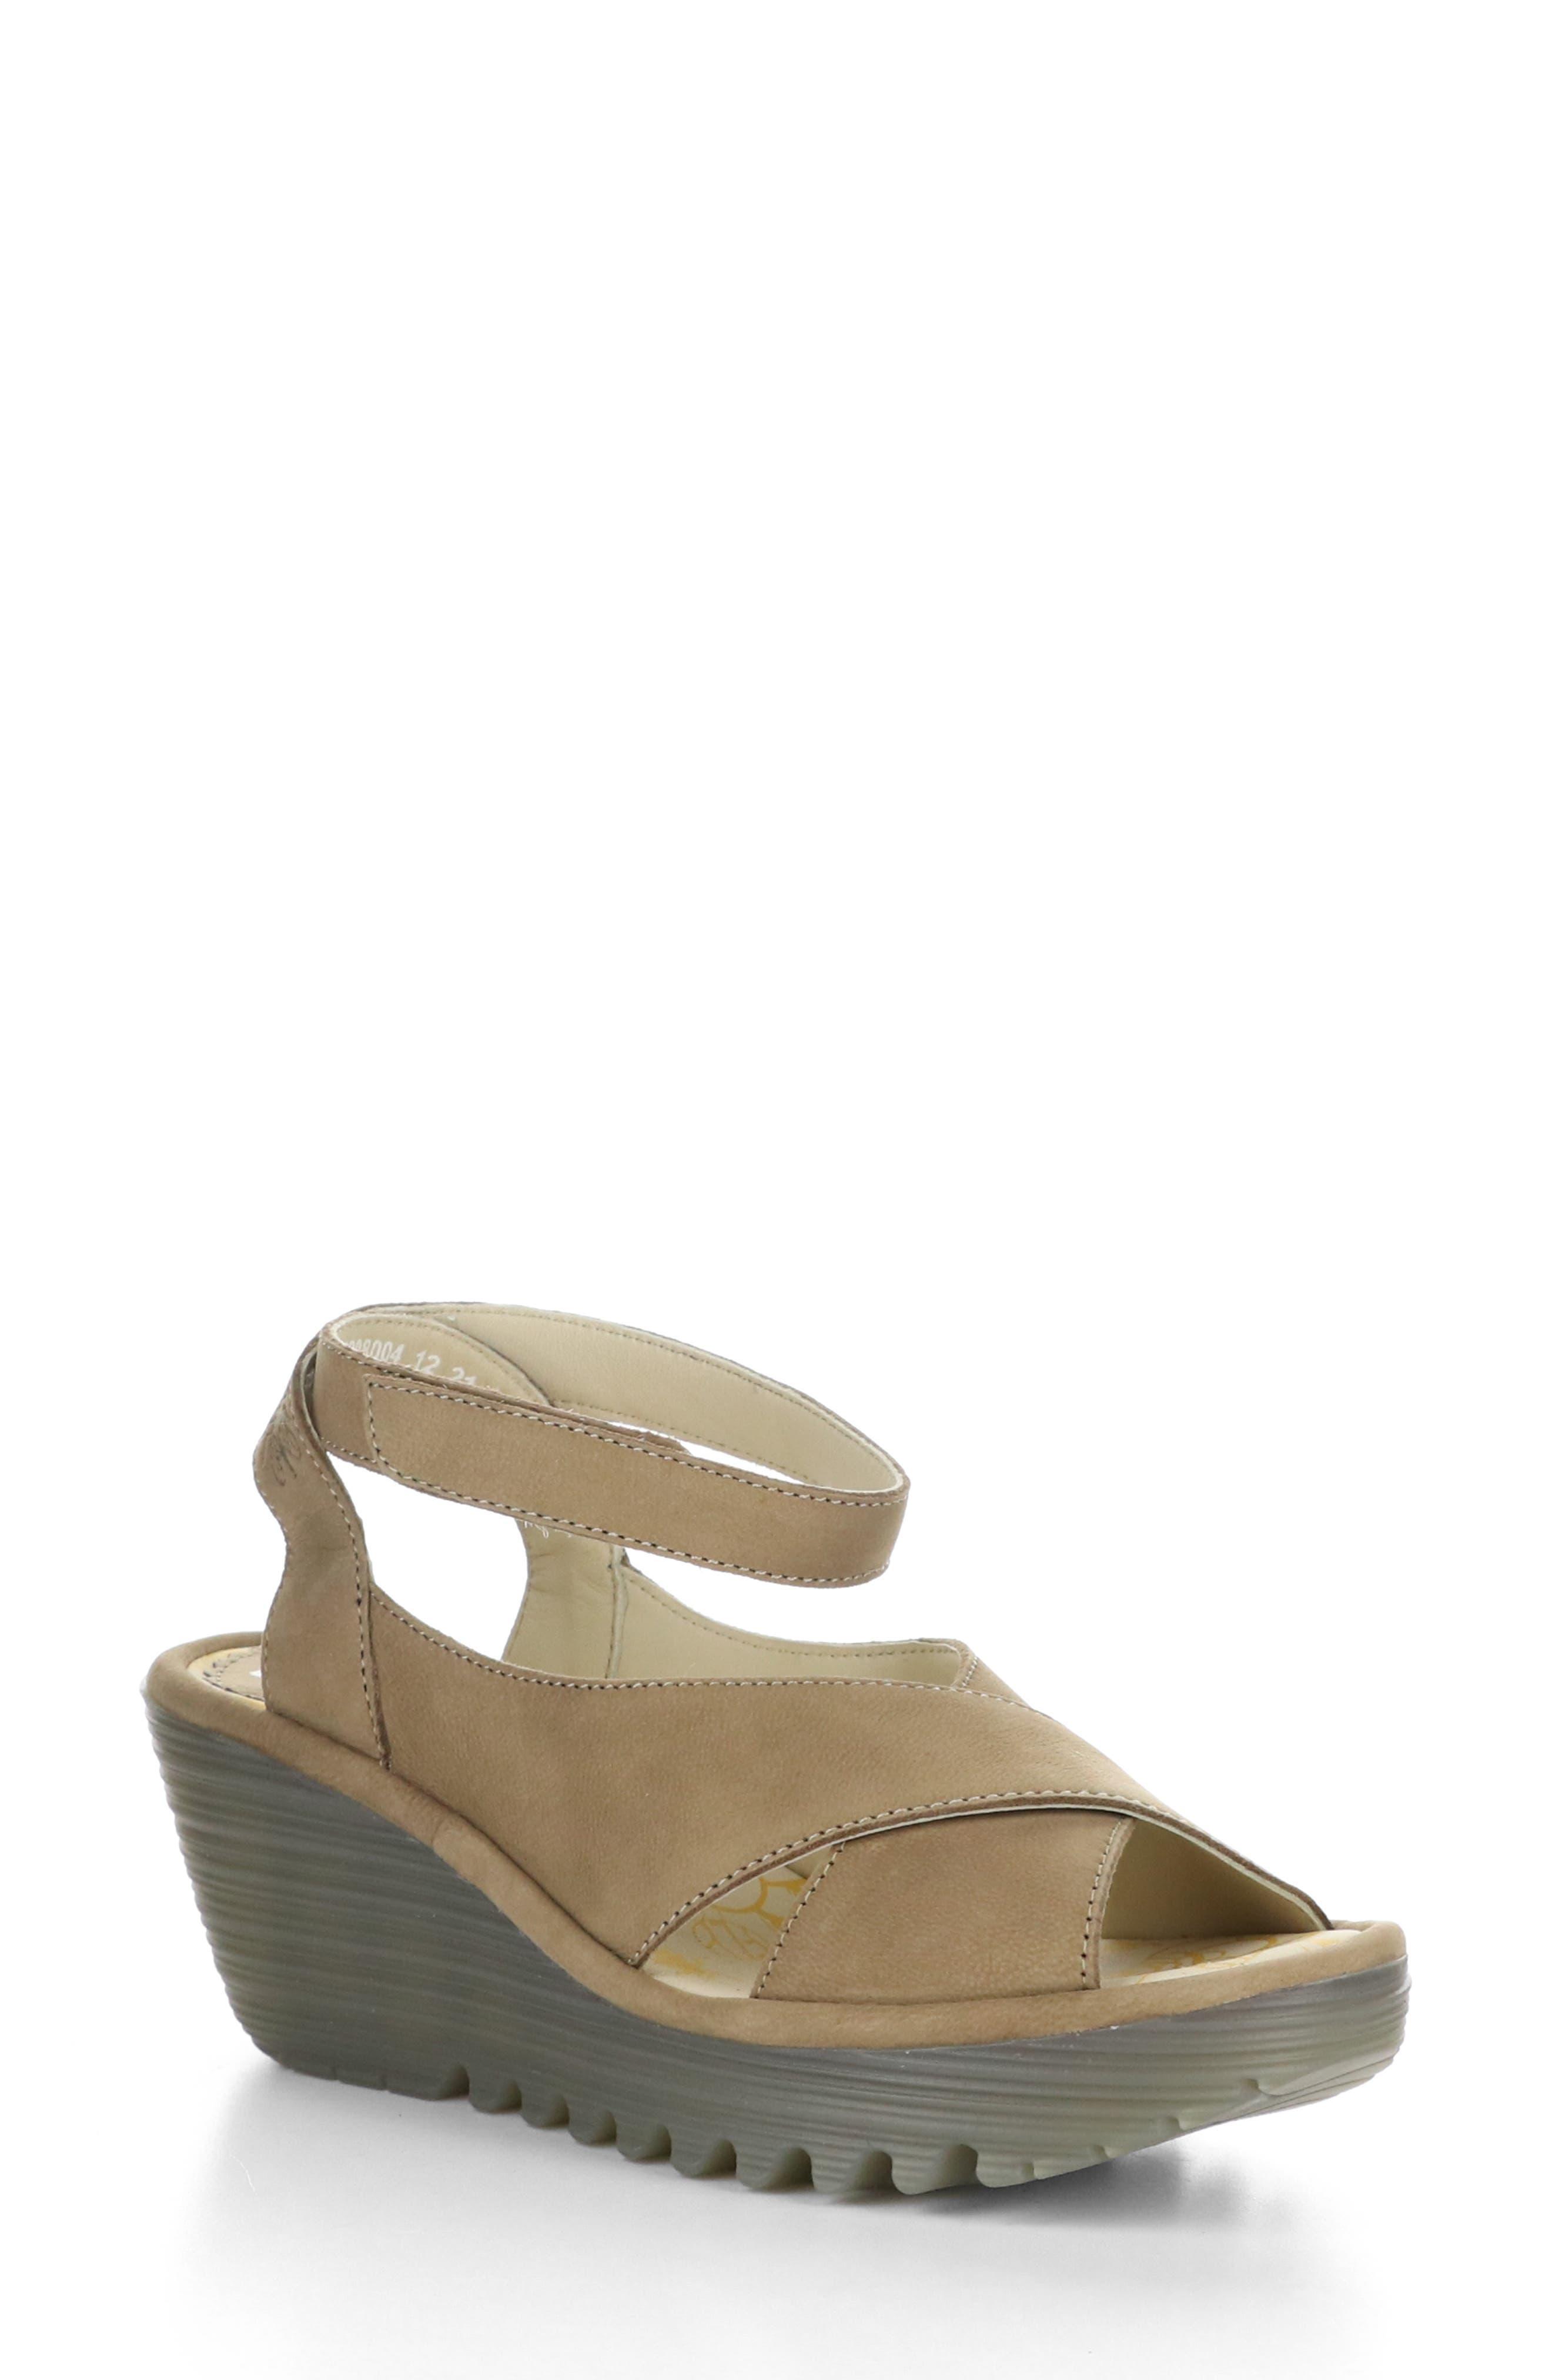 Yivi Wedge Sandal